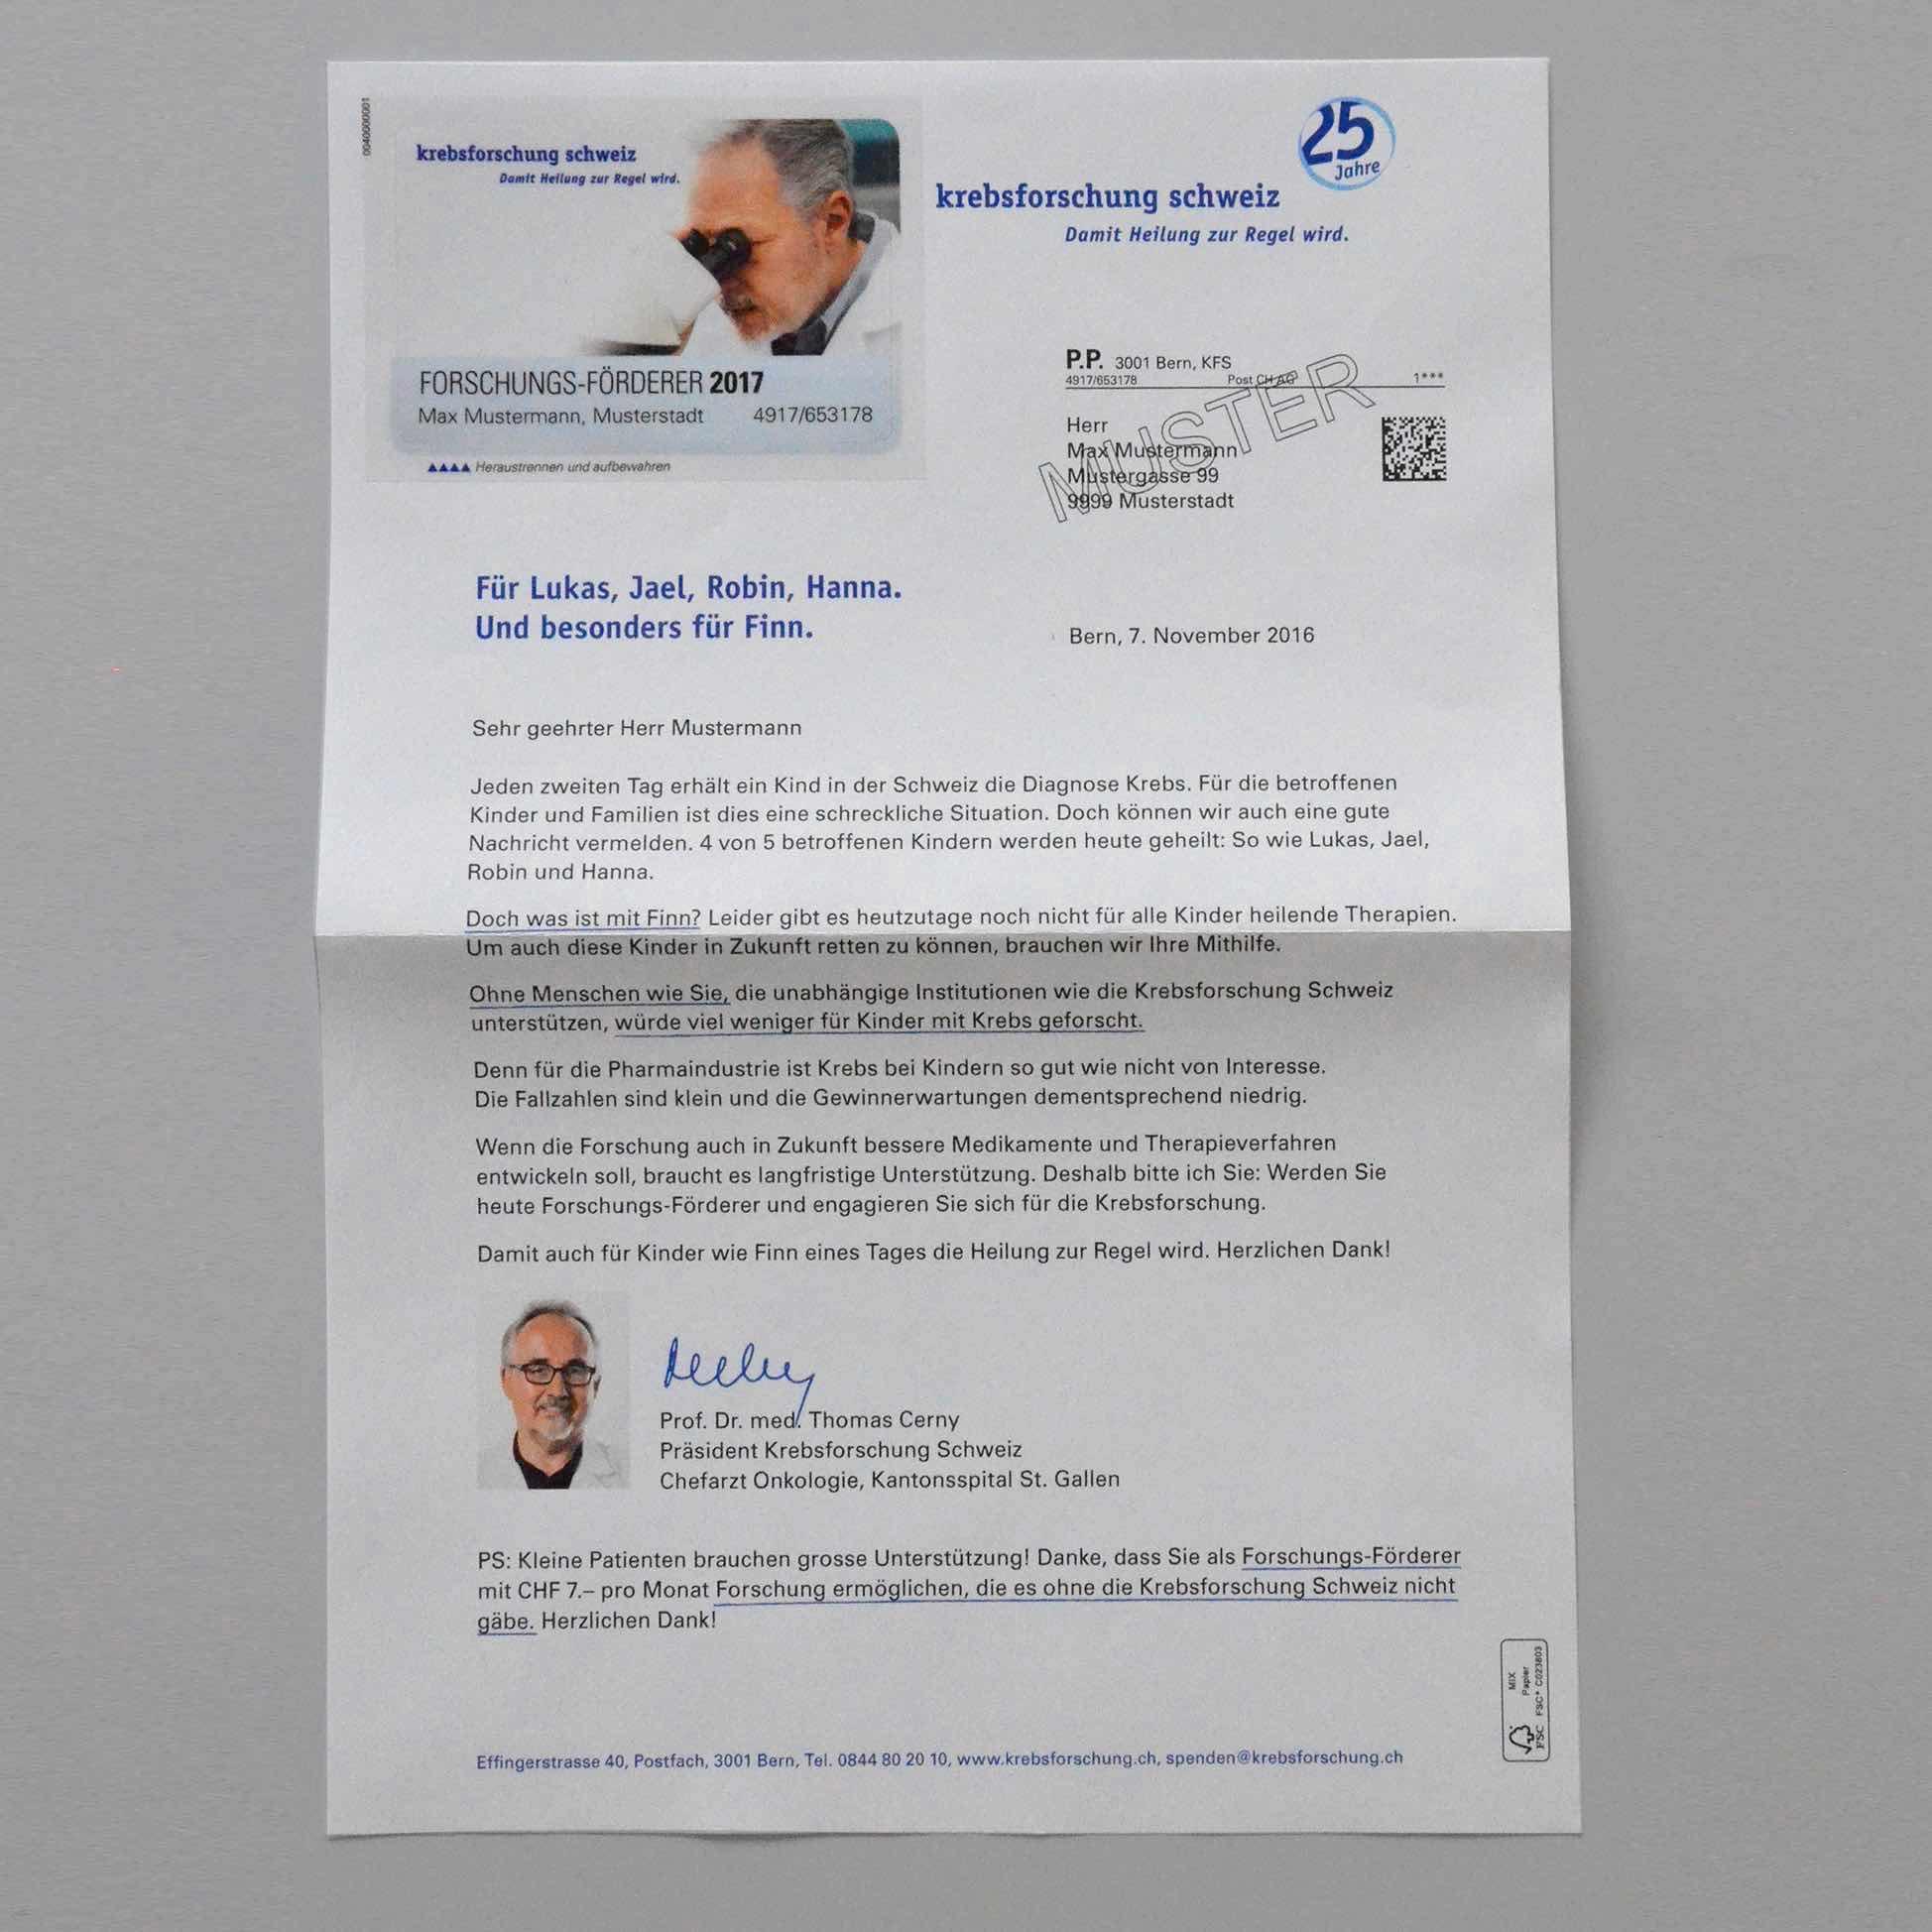 Copy of Krebsforschung Schweiz: Brief Spendermailing November 2017